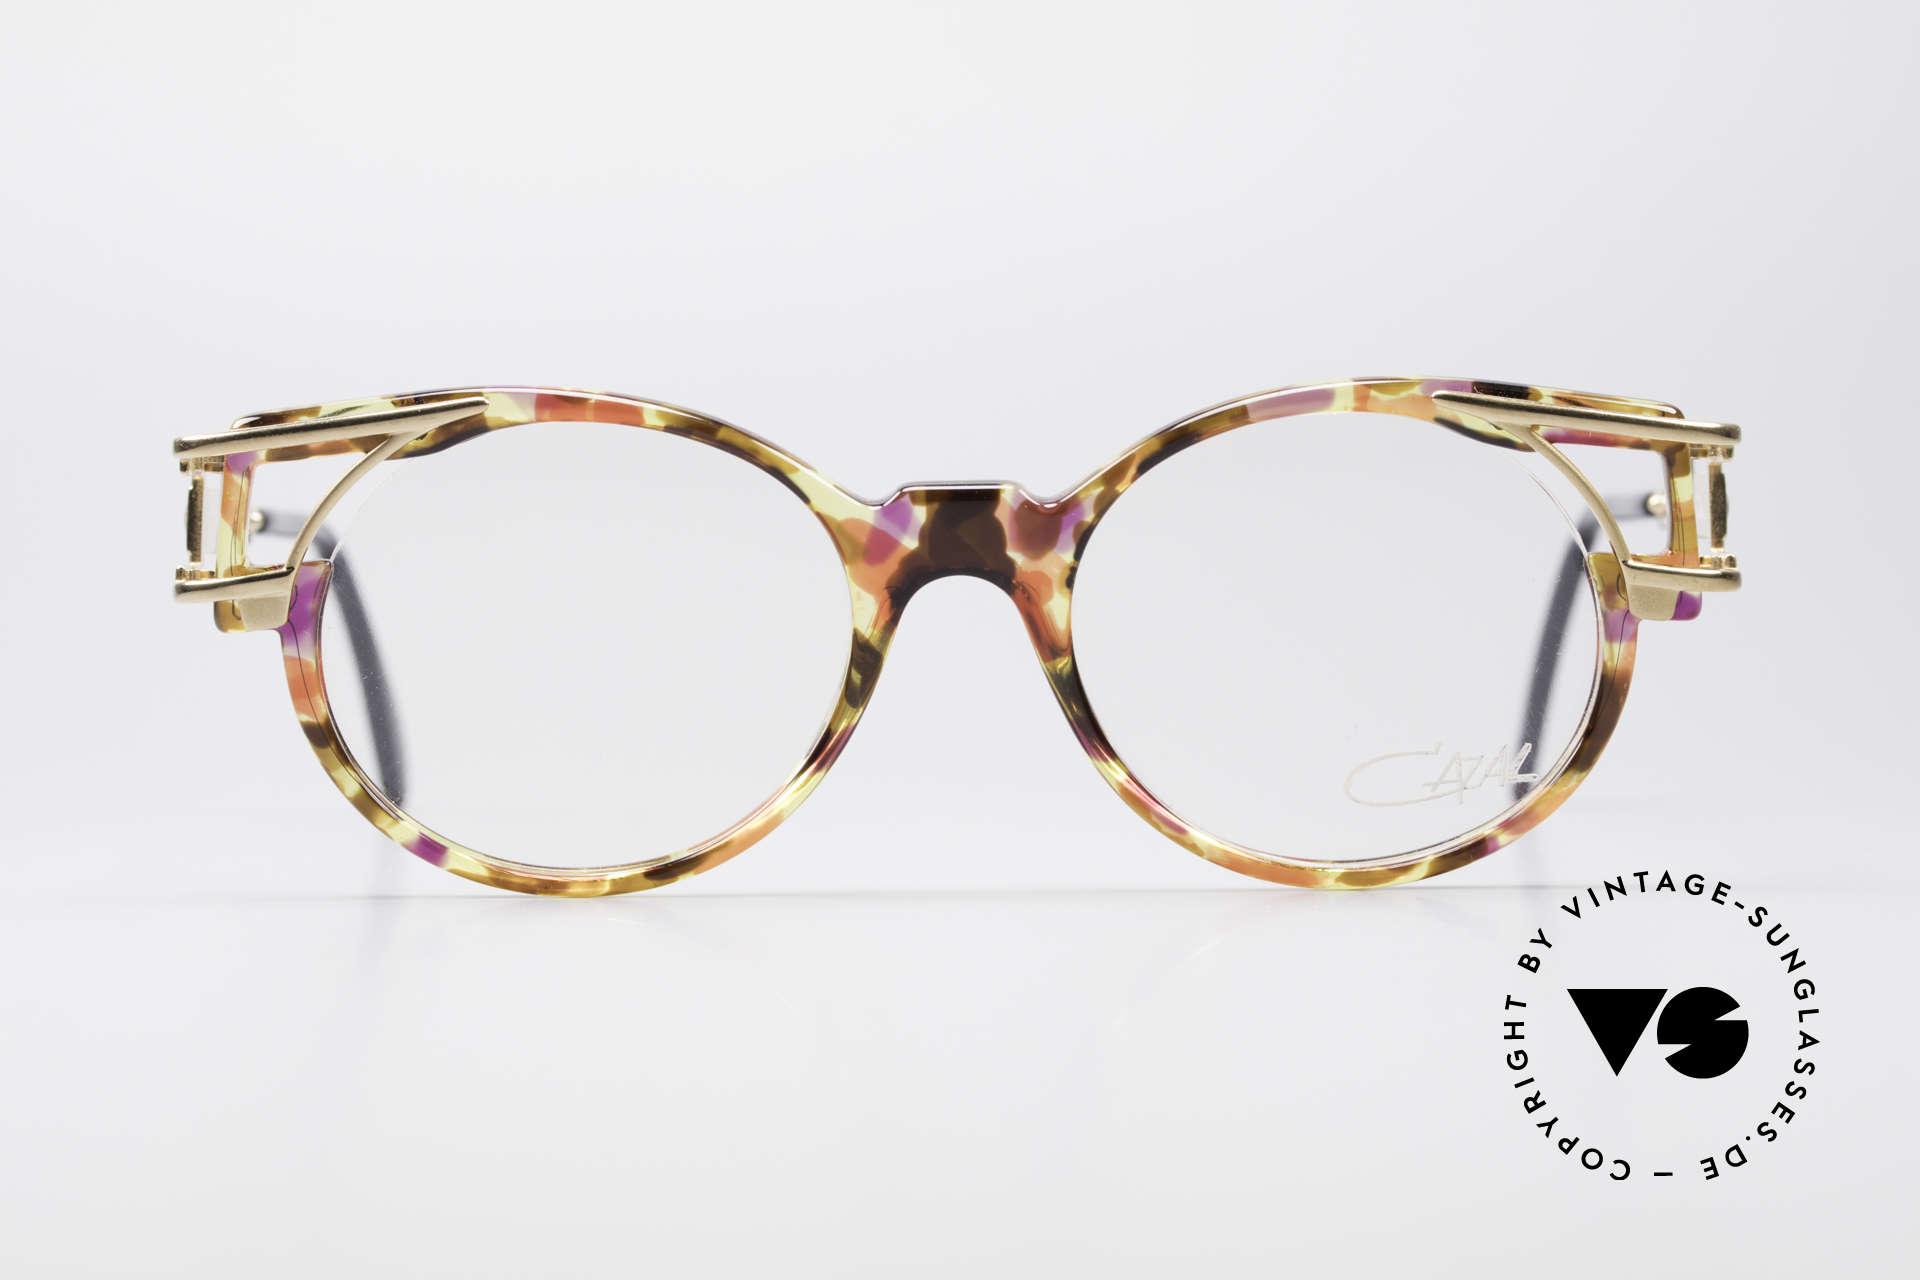 Cazal 353 Old School Hip Hop Eyeglasses, at that time, the HIP-HOP eyeglasses par excellence, Made for Men and Women